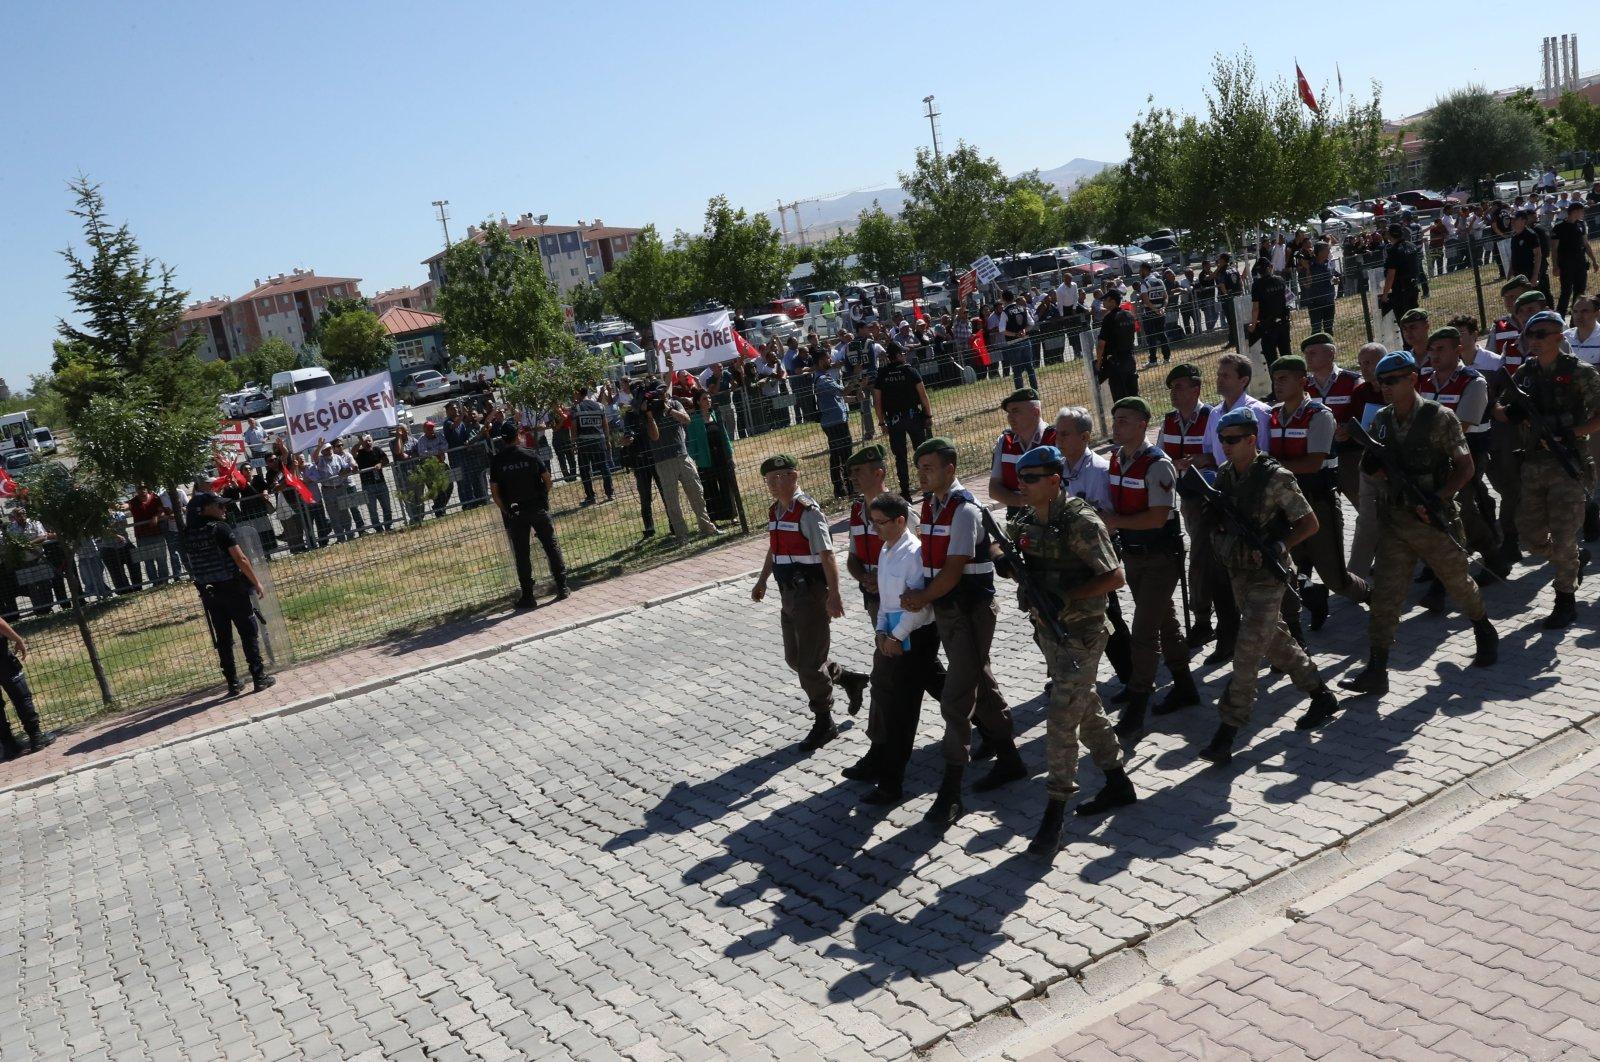 Soldiers accompany defendants to the courthouse for the Akıncı trial, in Ankara, Turkey, Aug. 1, 2017. (PHOTO BY ALİ EKEYILMAZ)